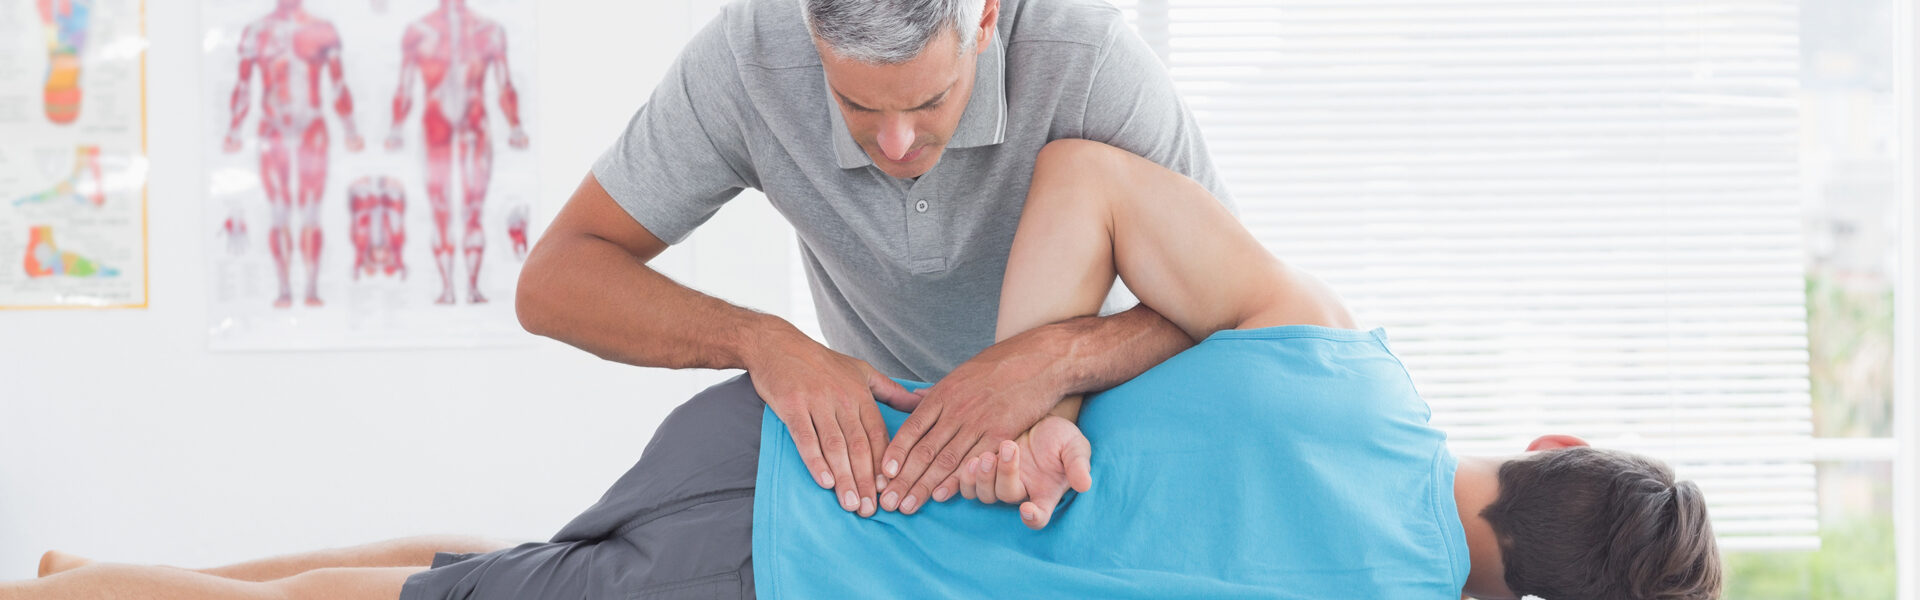 Lower Back Pain Treatment in Traverse City, MI